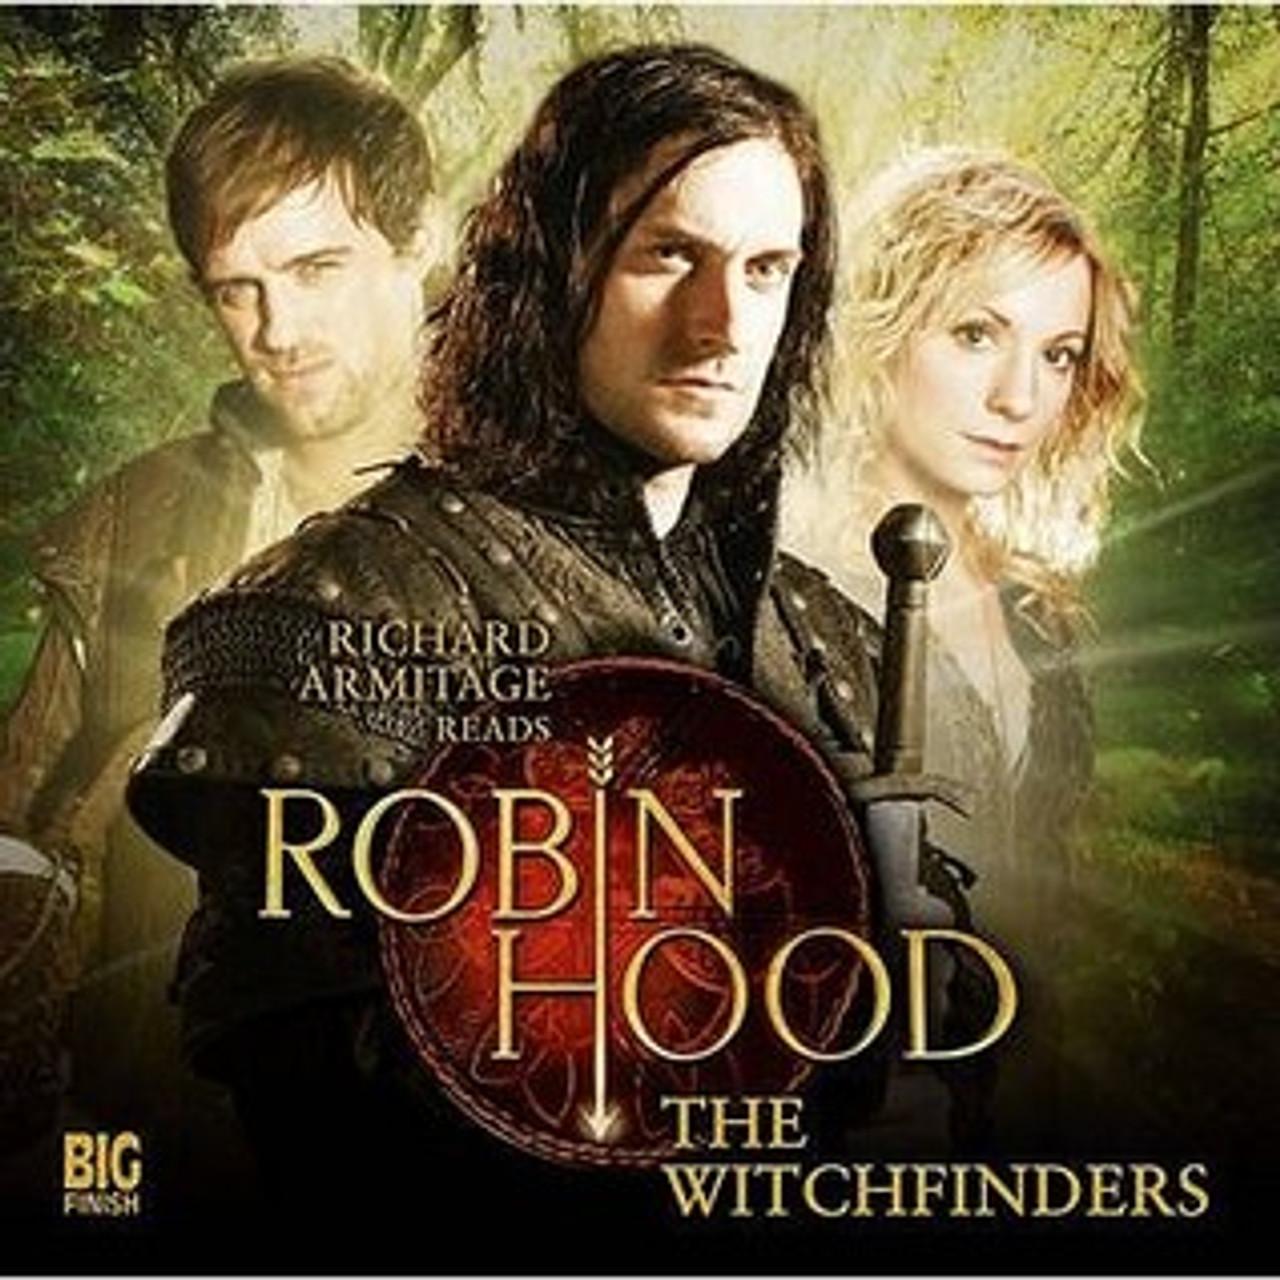 Big Finish   Robin Hood The Witchfinders Audio CD 20.20